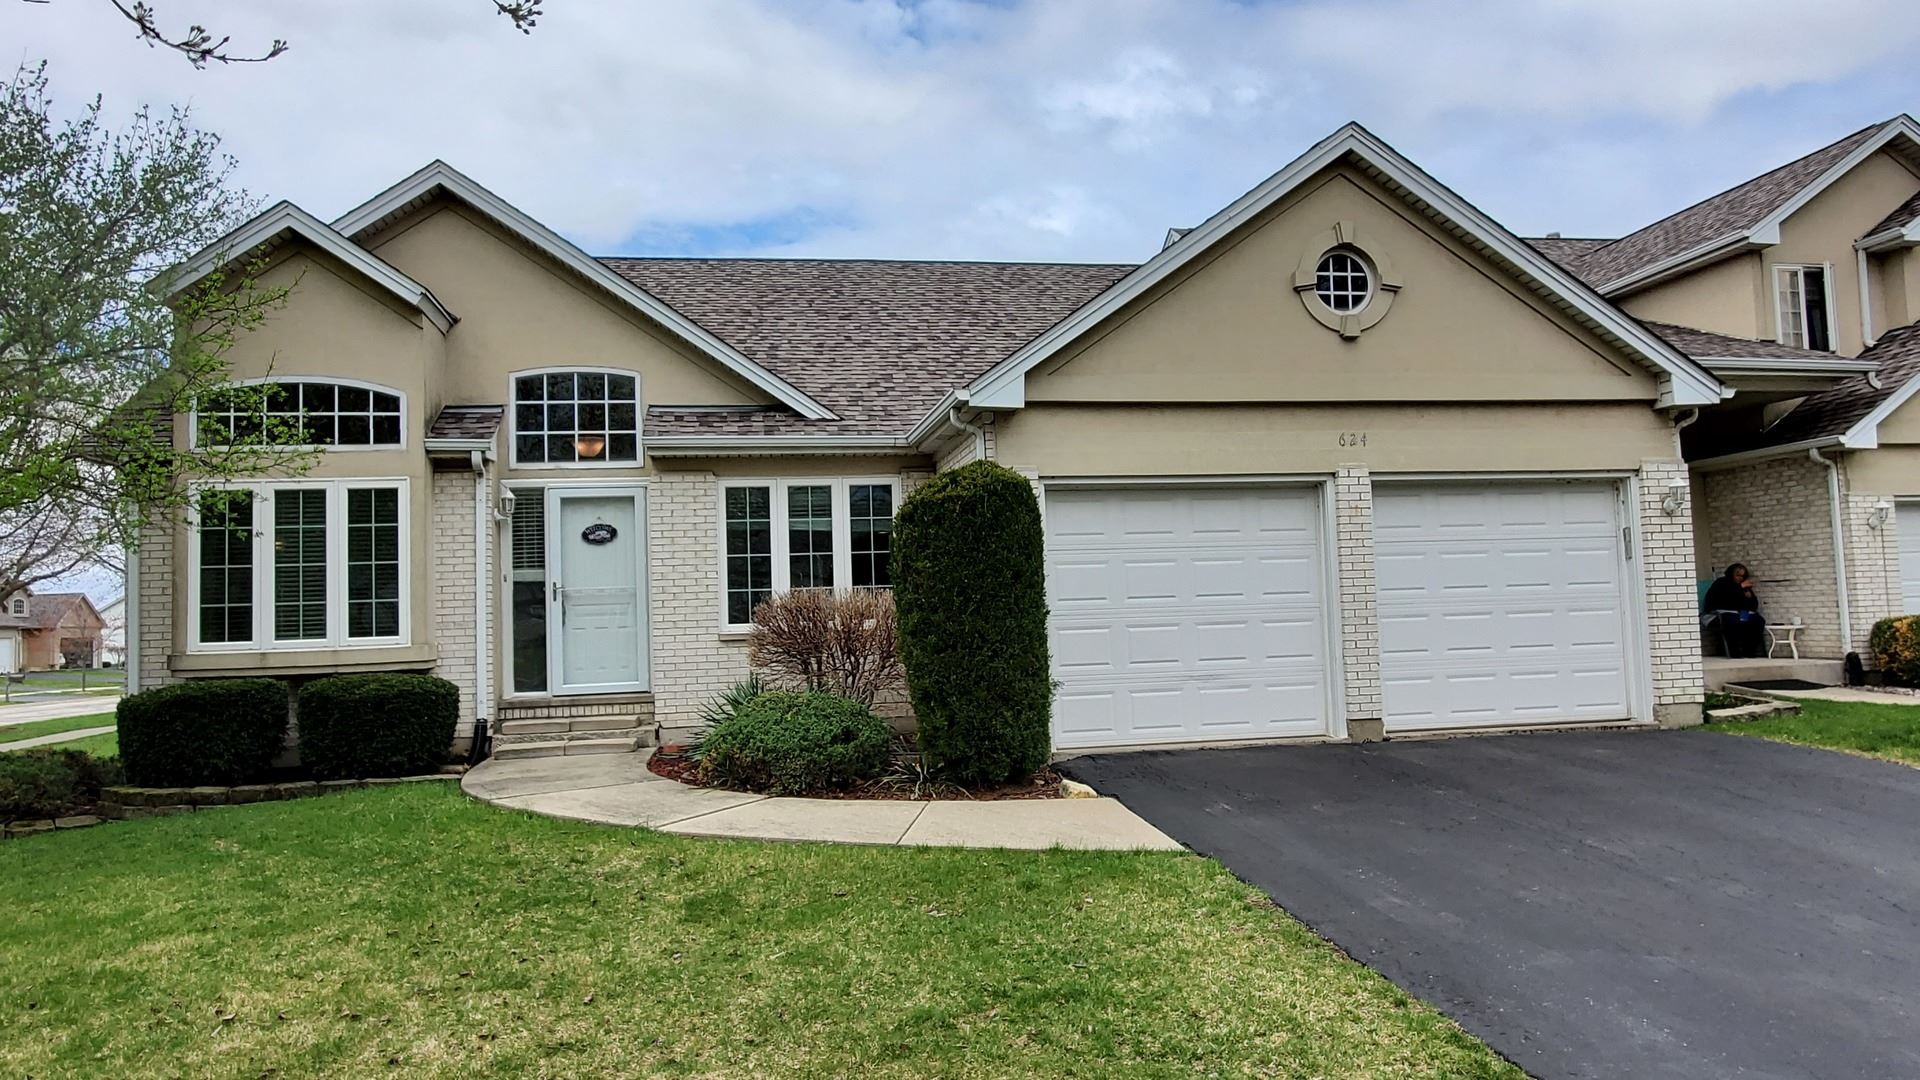 Photo of 624 Aspen Drive #0, Romeoville, IL 60446 (MLS # 11050217)